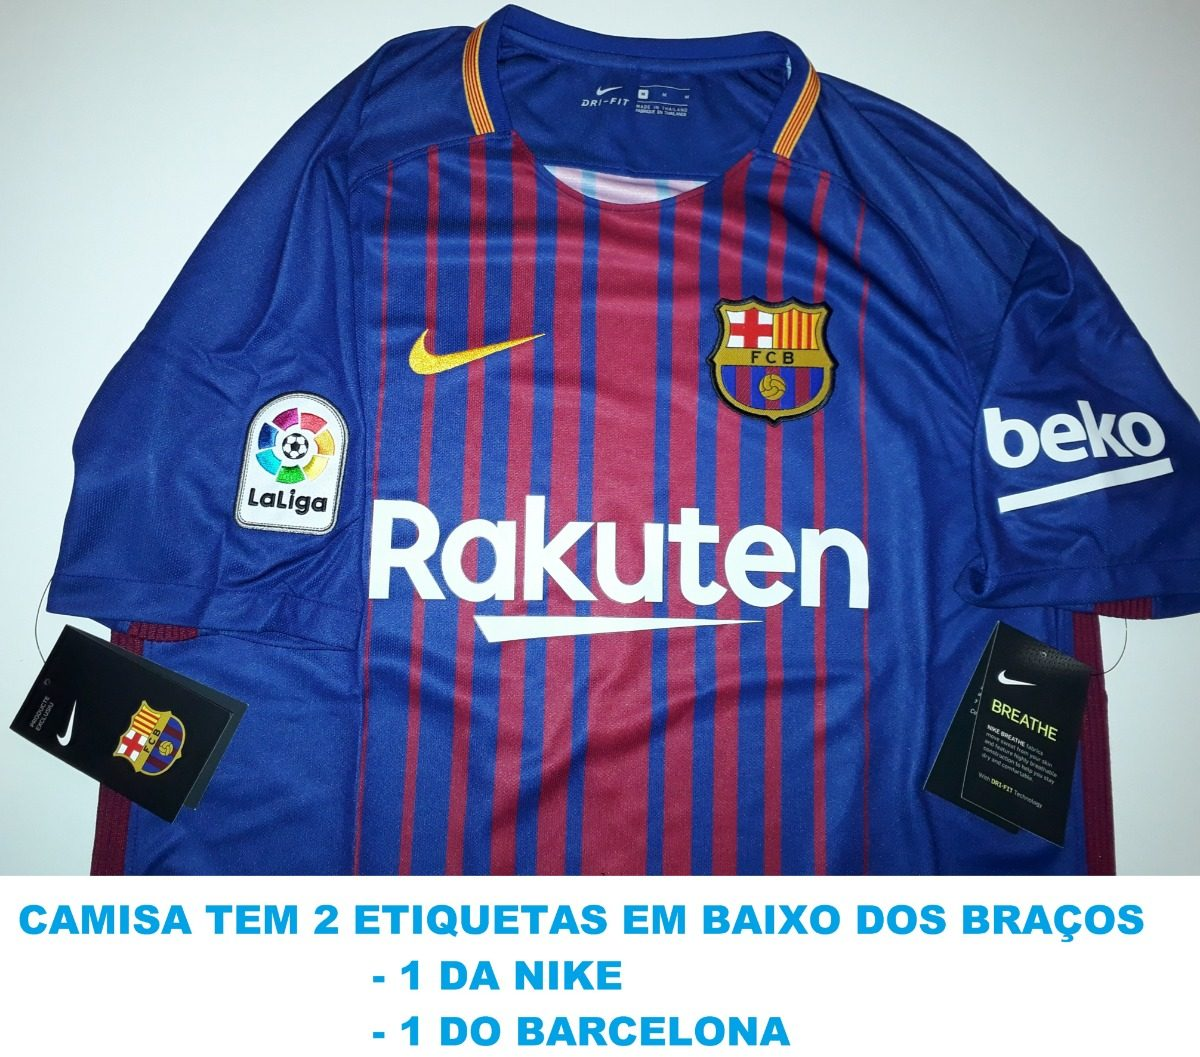 camisa barcelona 2018 100% original nike - 88. Carregando zoom. f05ad18bce6